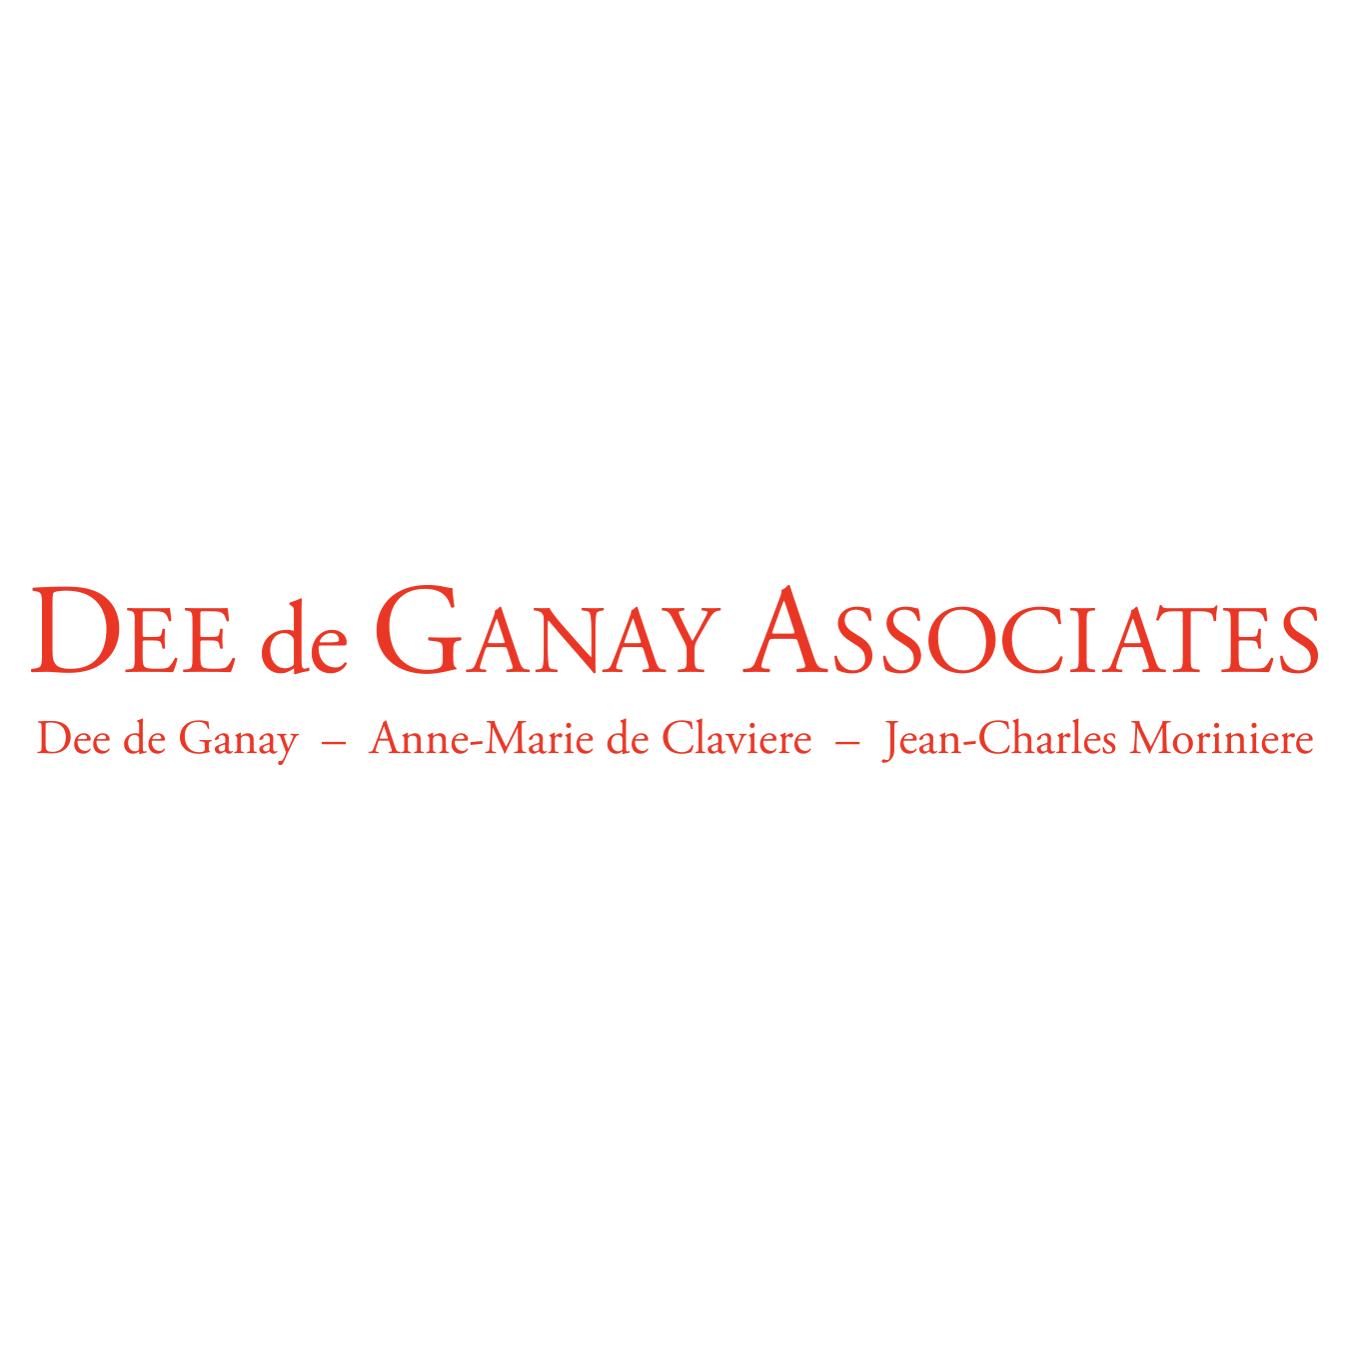 Dee de Ganay Associates, LLC